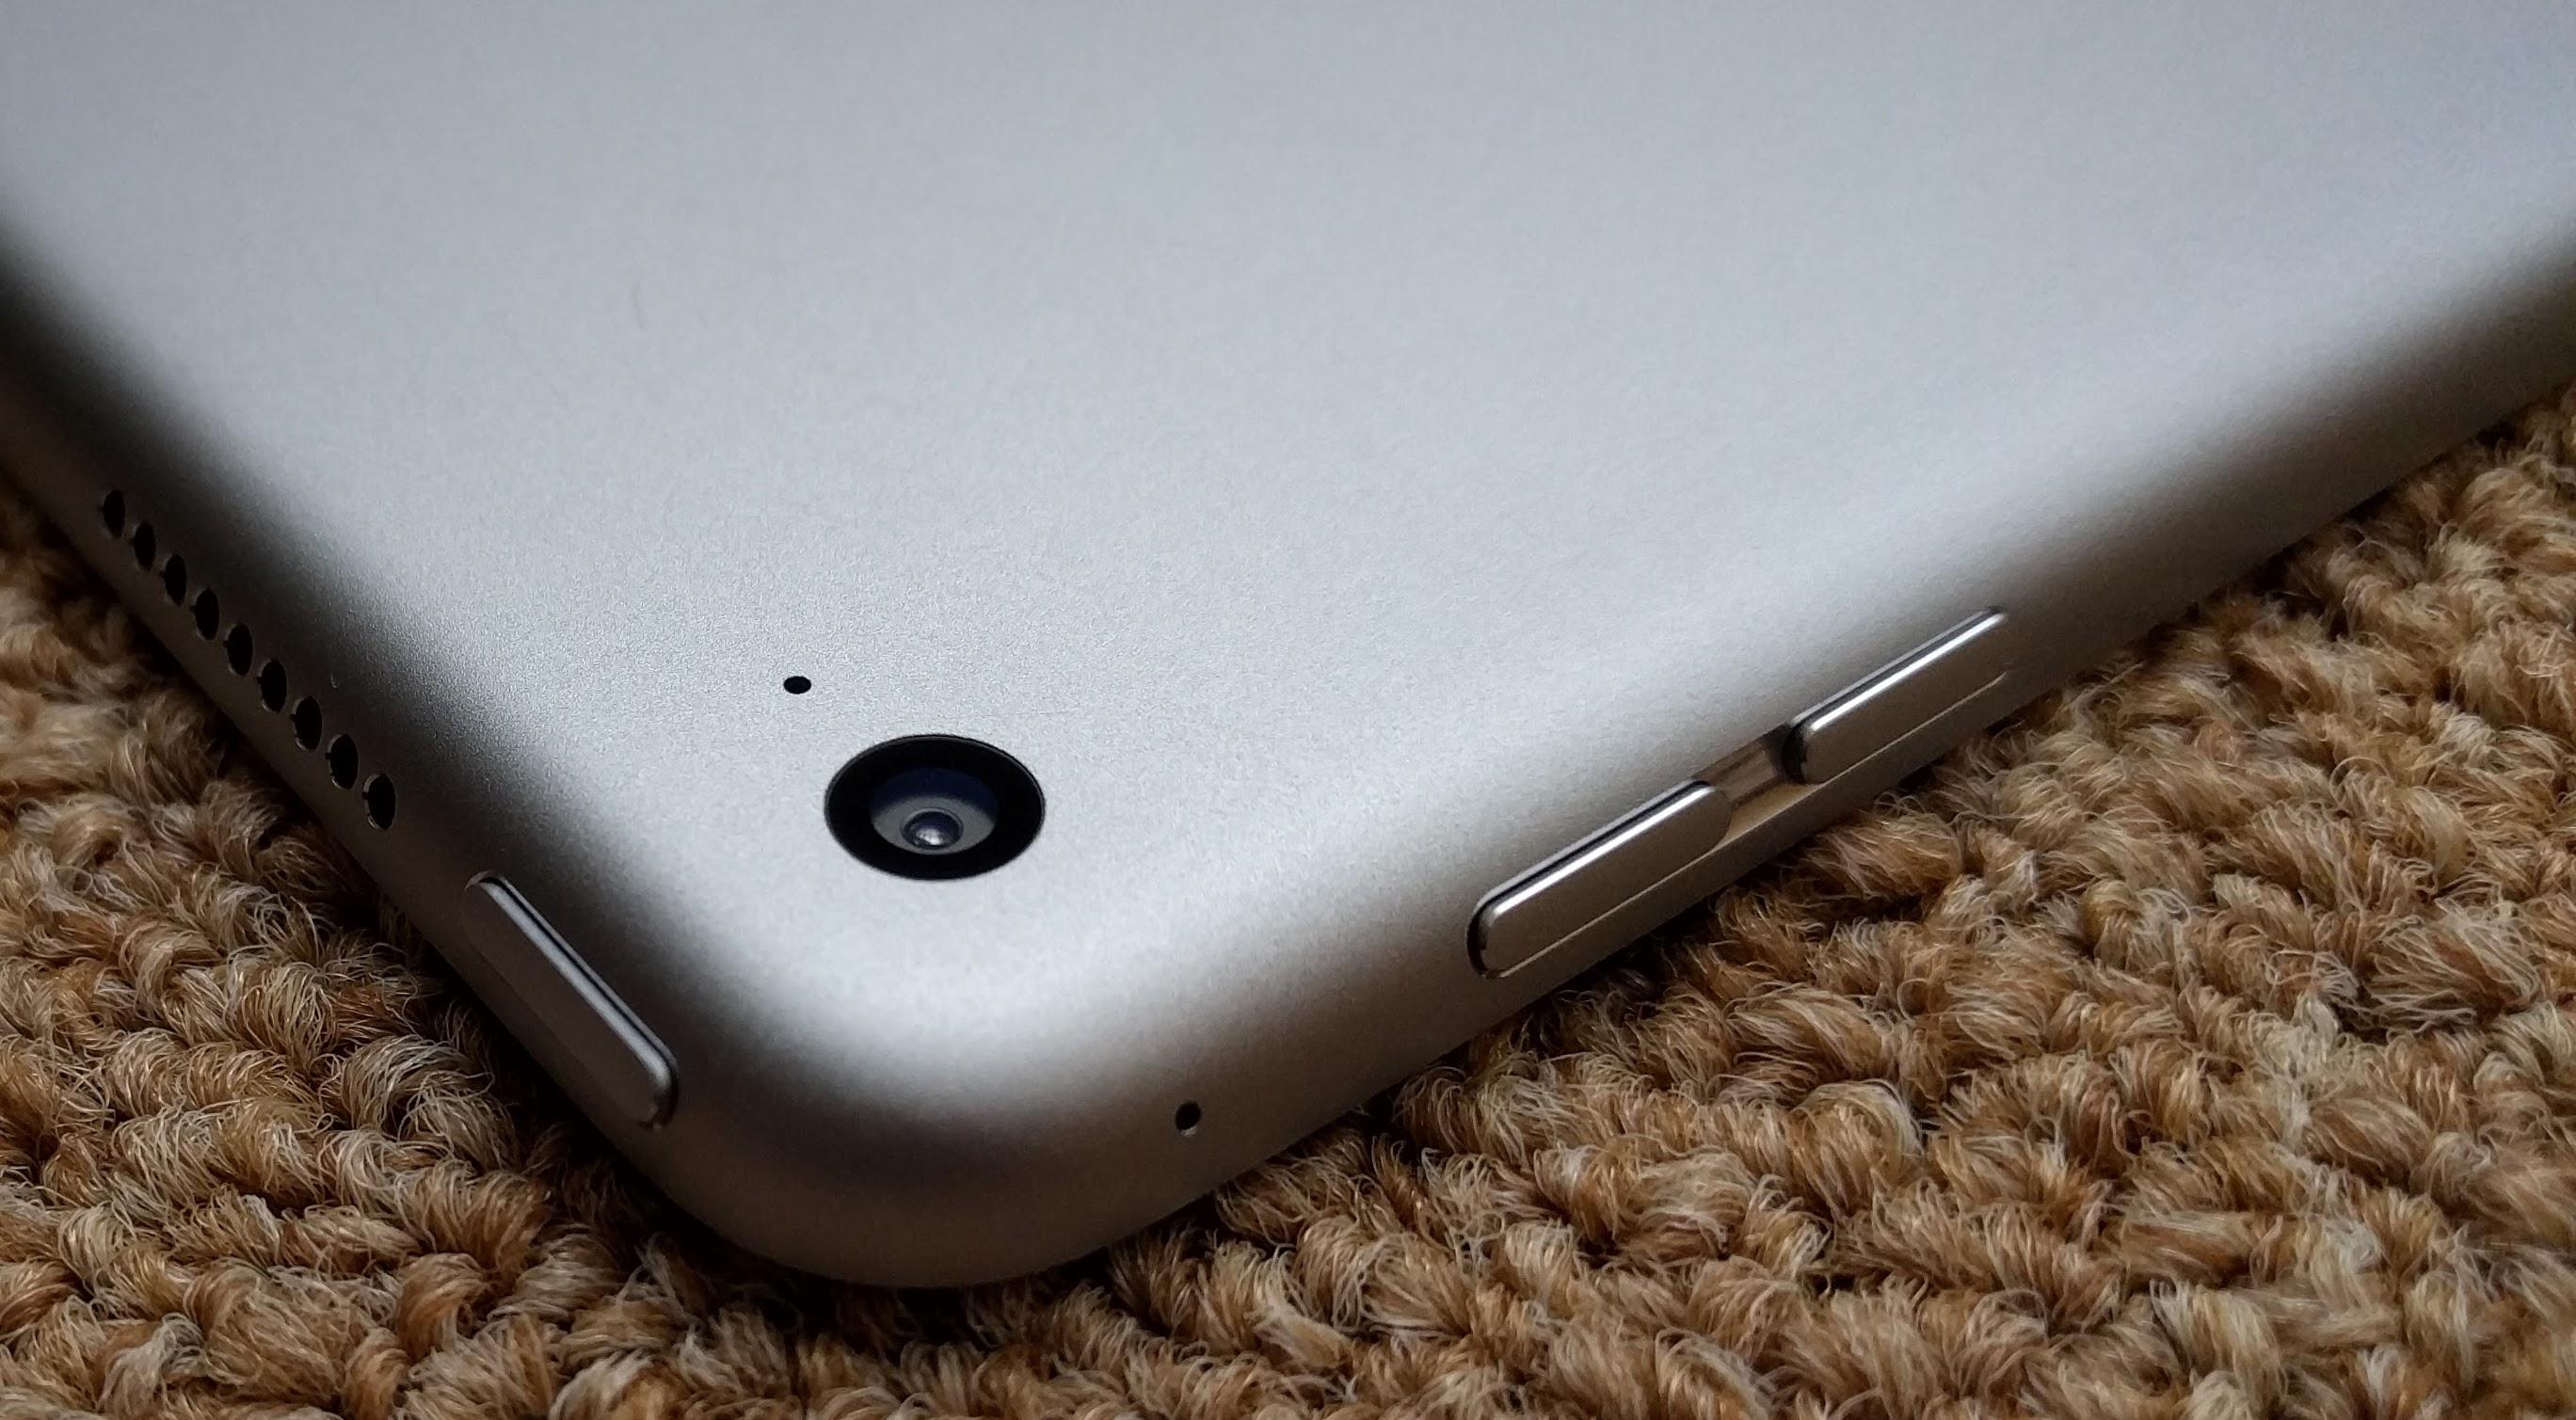 The back camera on the iPad Pro.